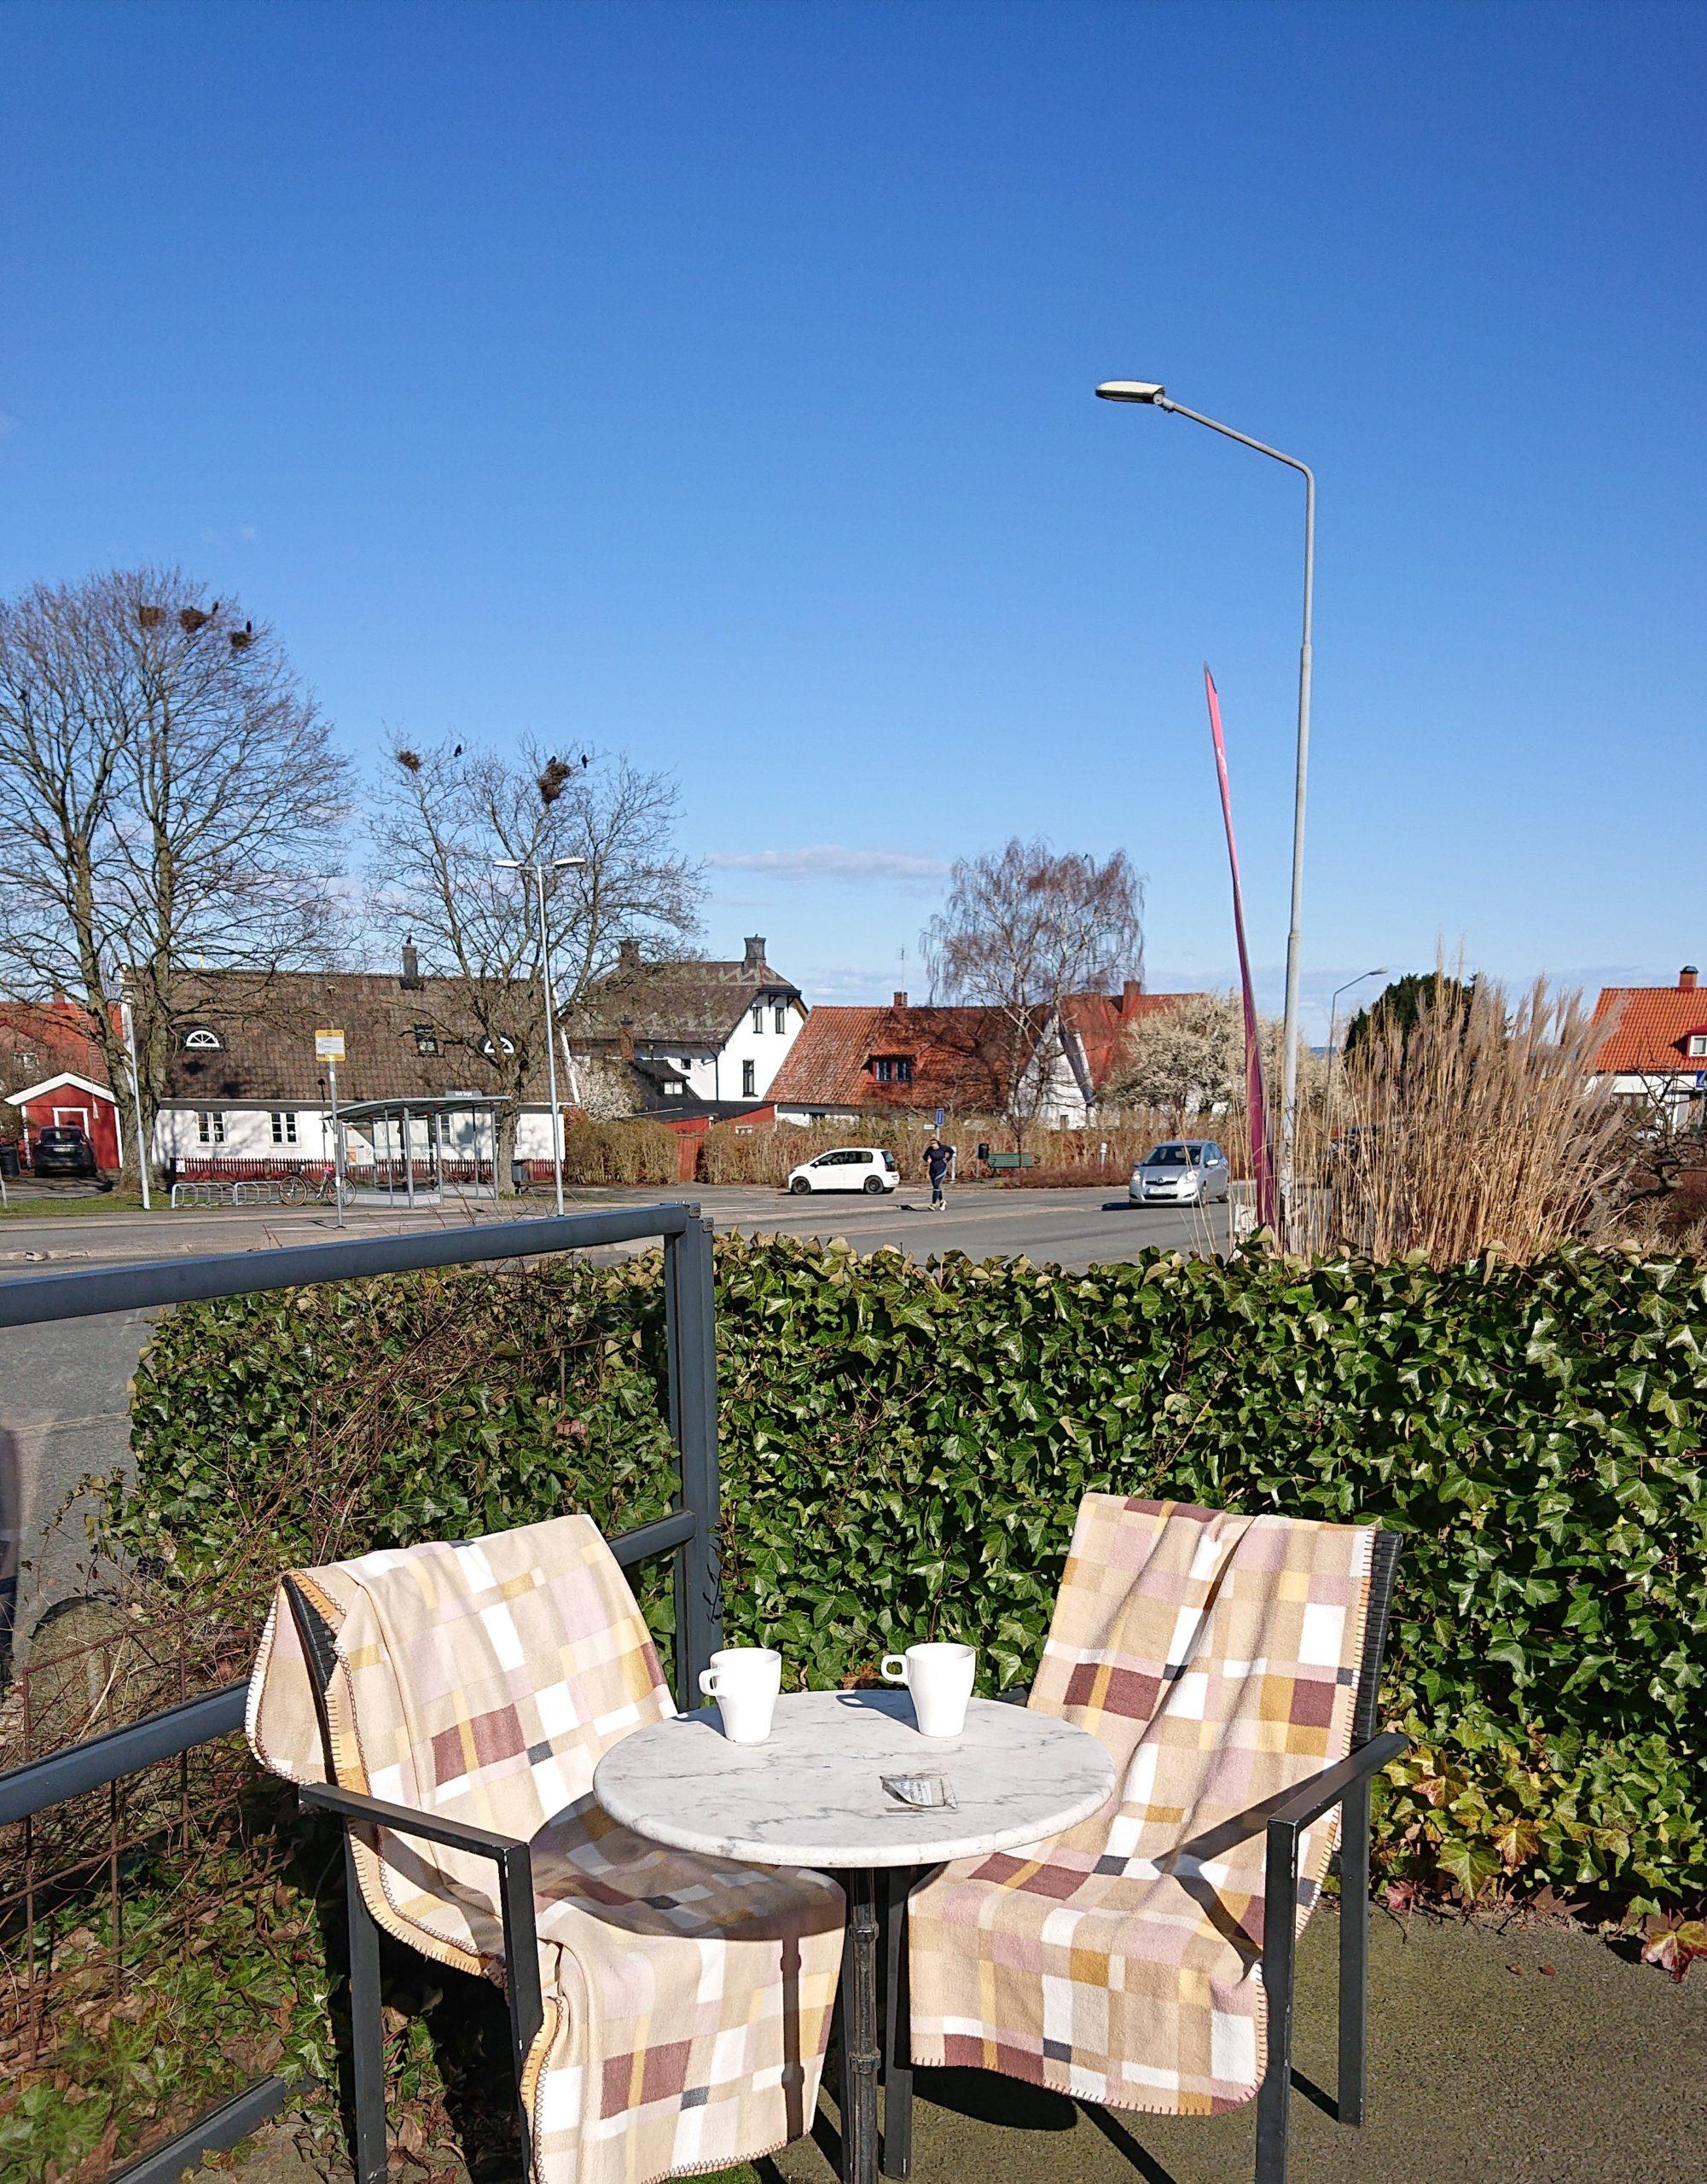 Outdoor seating scaled österlen.se